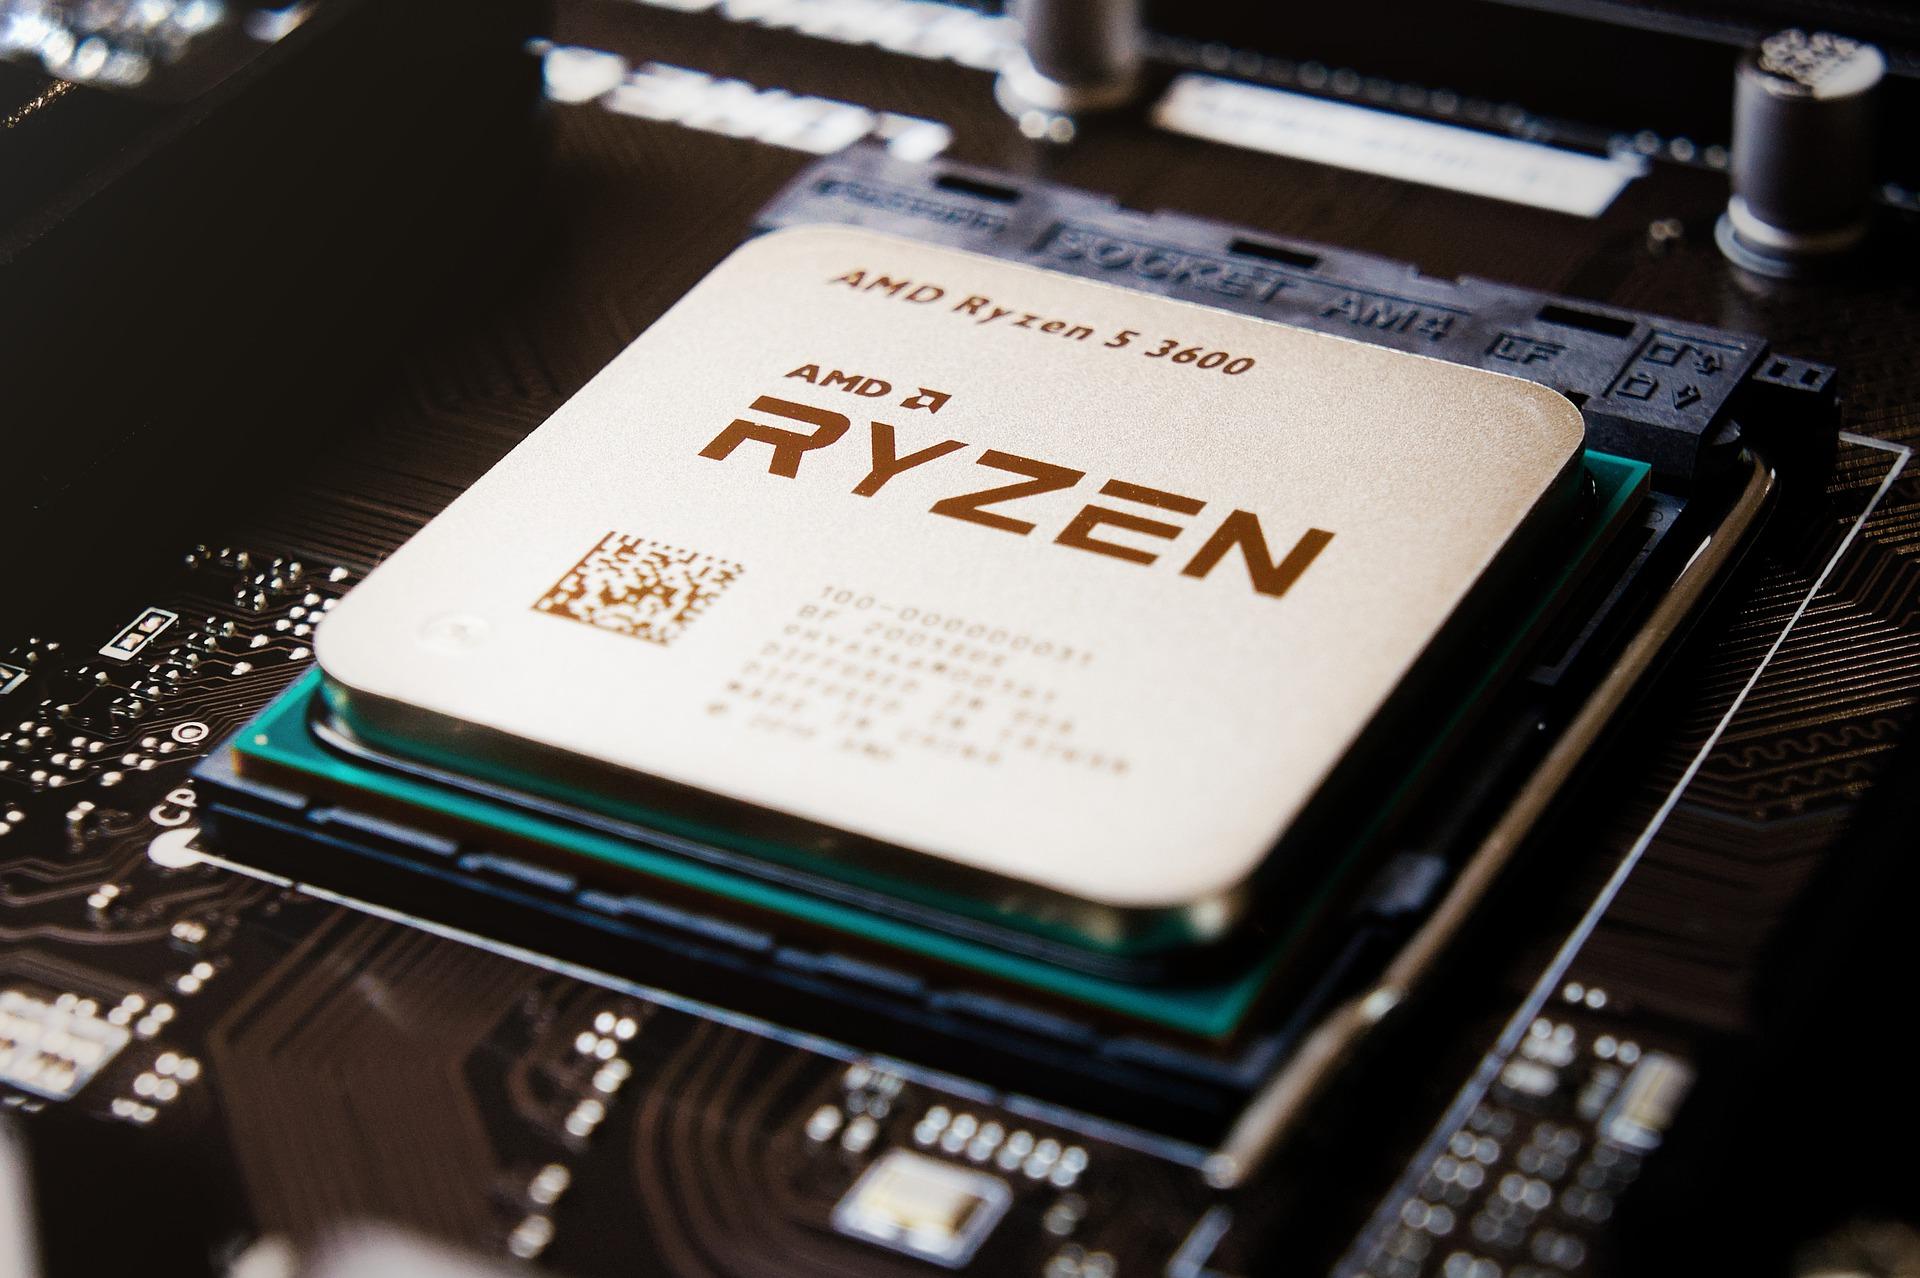 Processador AMD Ryzen.